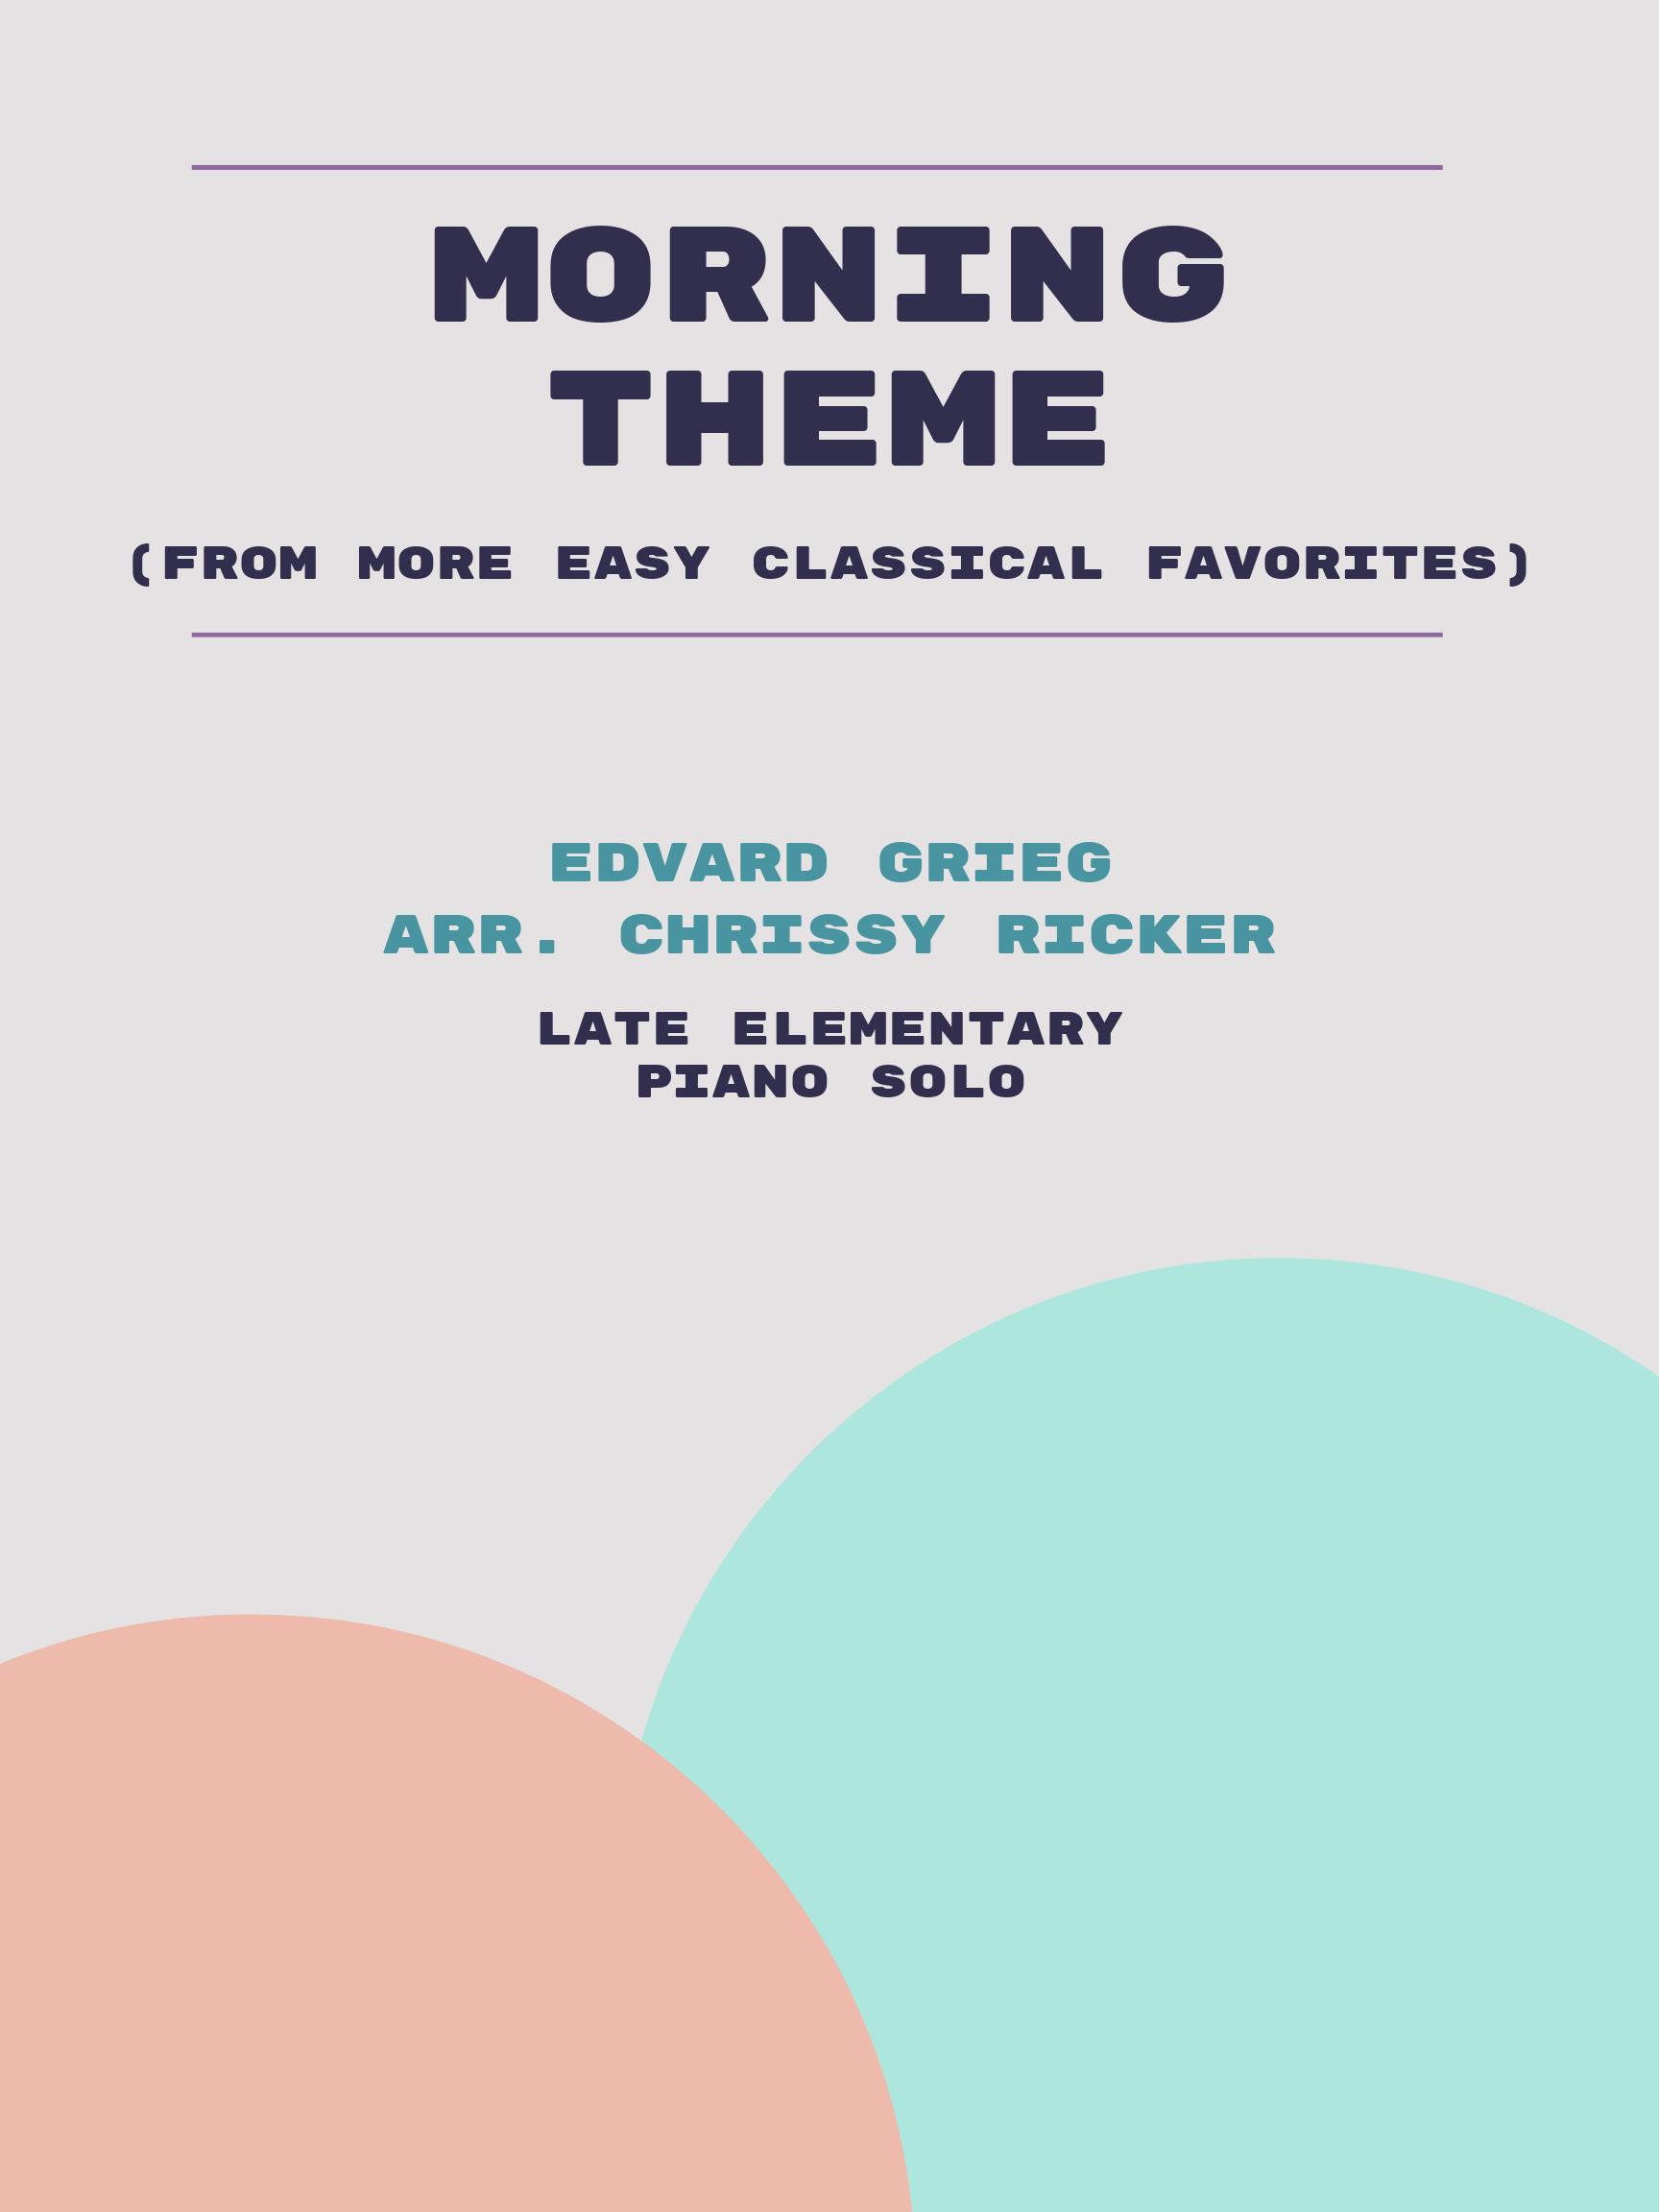 Morning Theme by Edvard Grieg